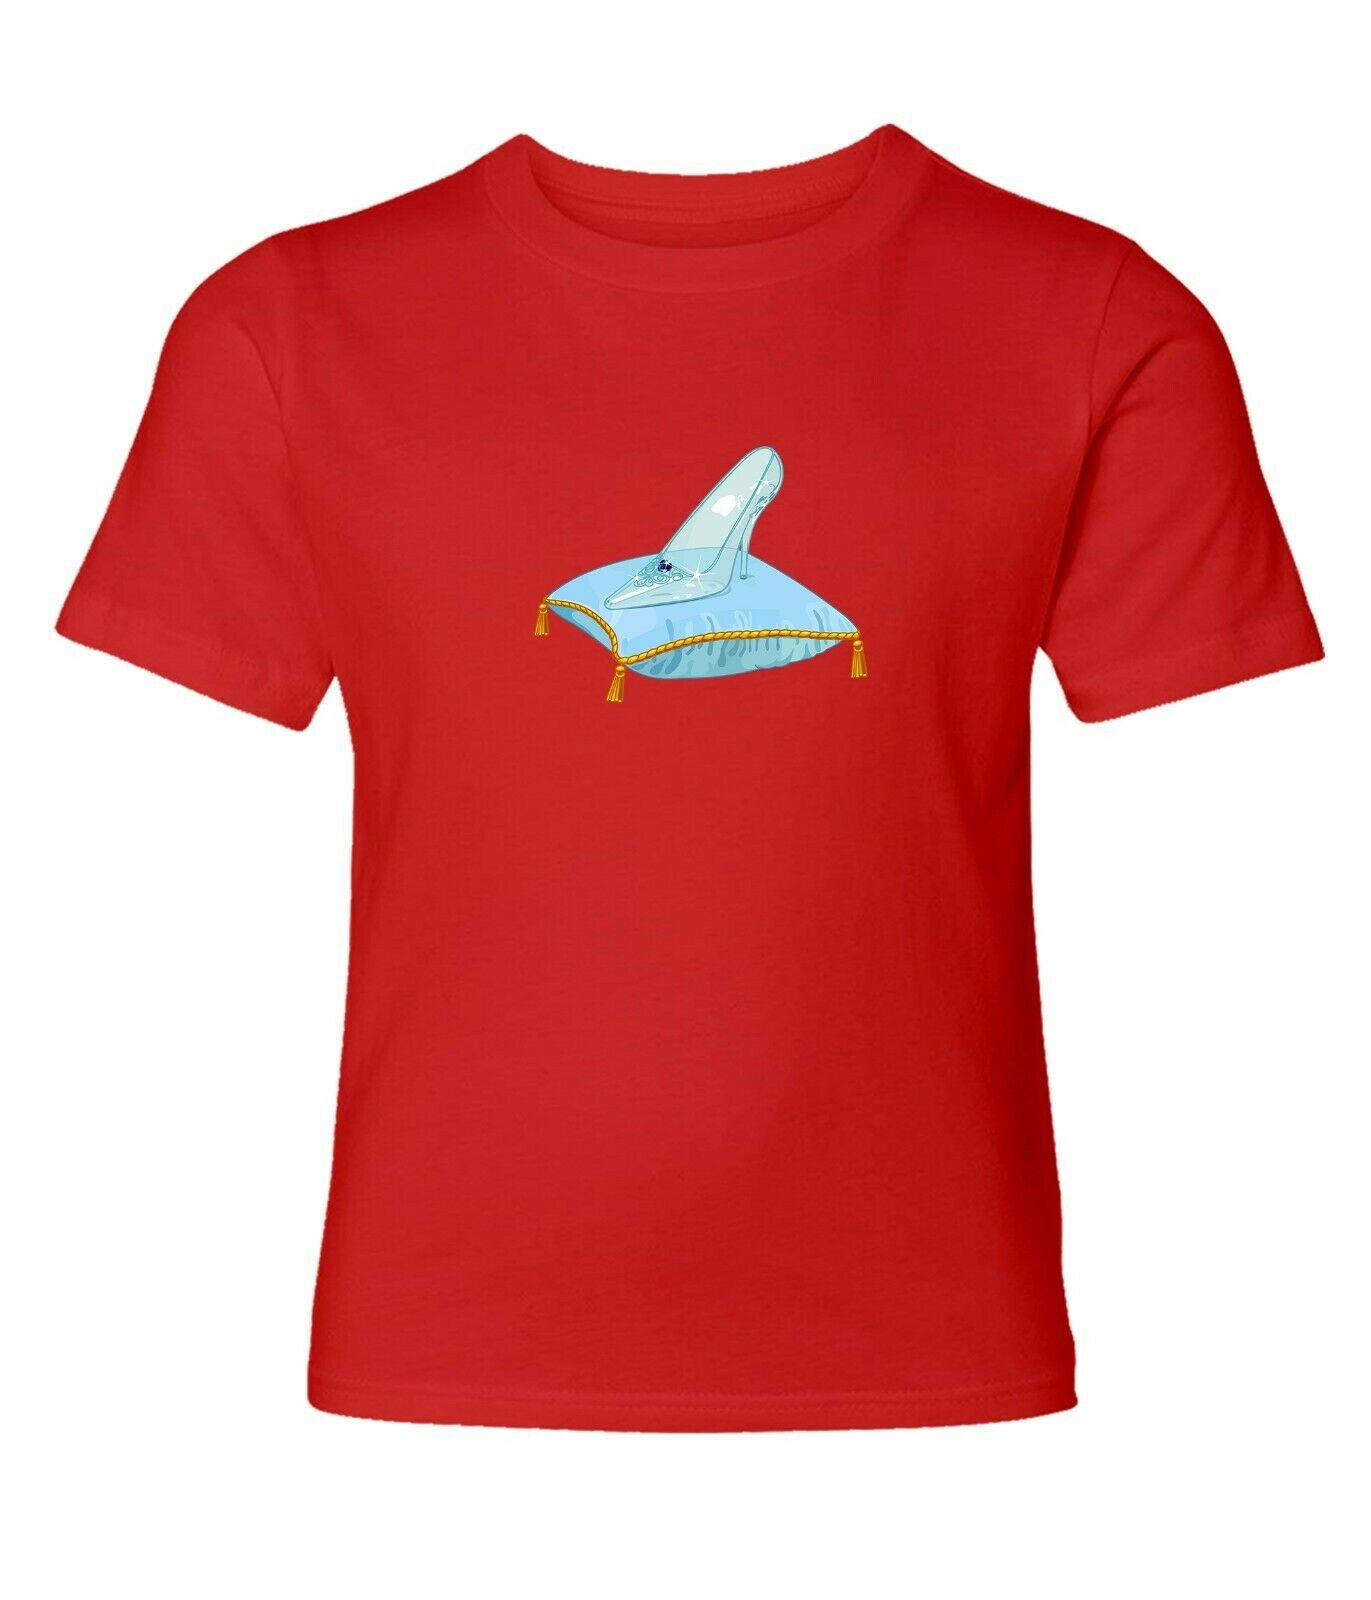 Disney Princess Cinderella Charming Glass Slipper Men Women Unisex T-shirt 806